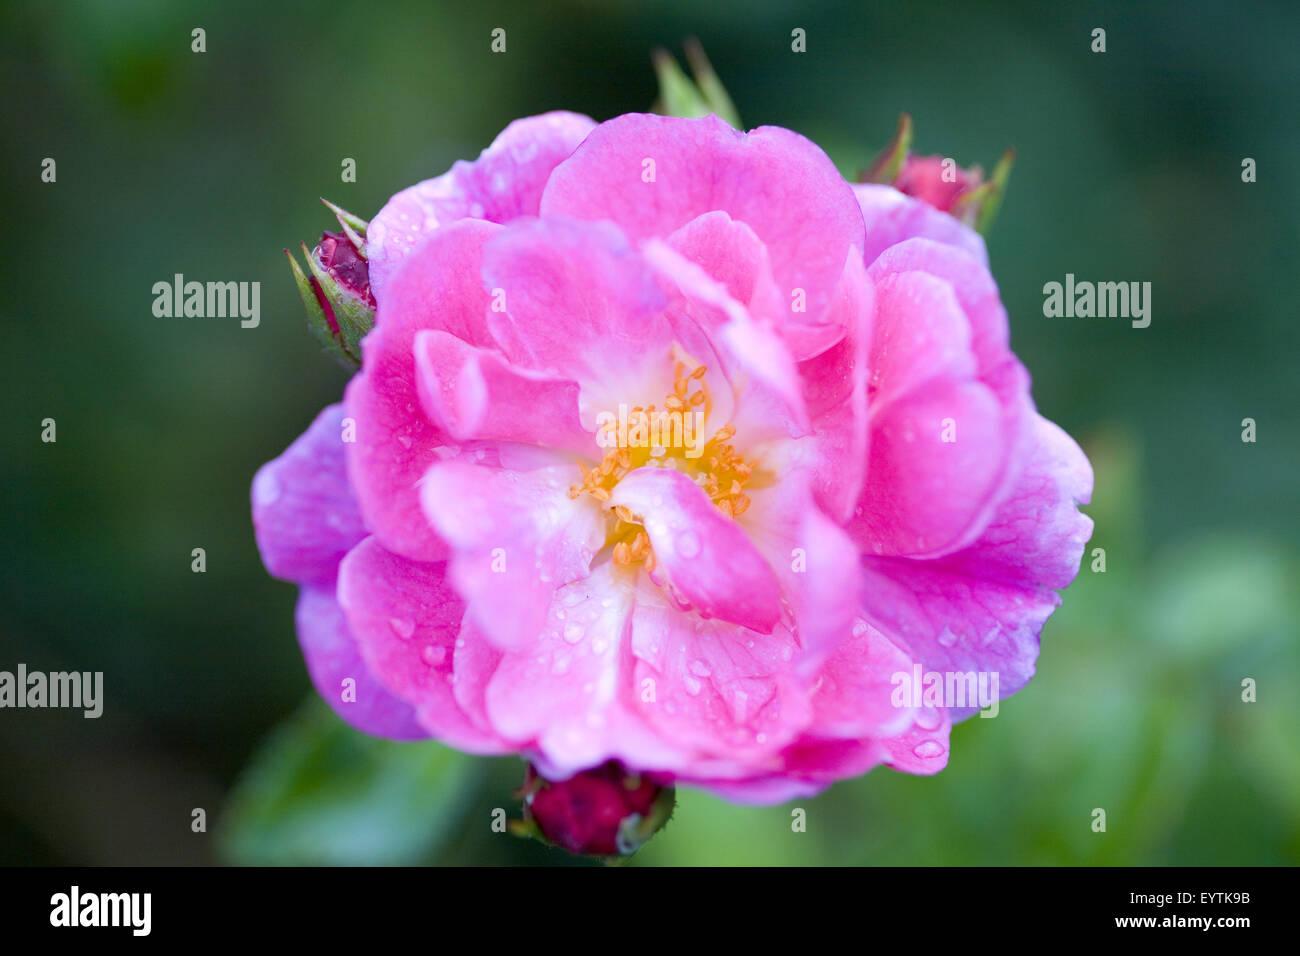 magenta coloured rose, close-up - Stock Image